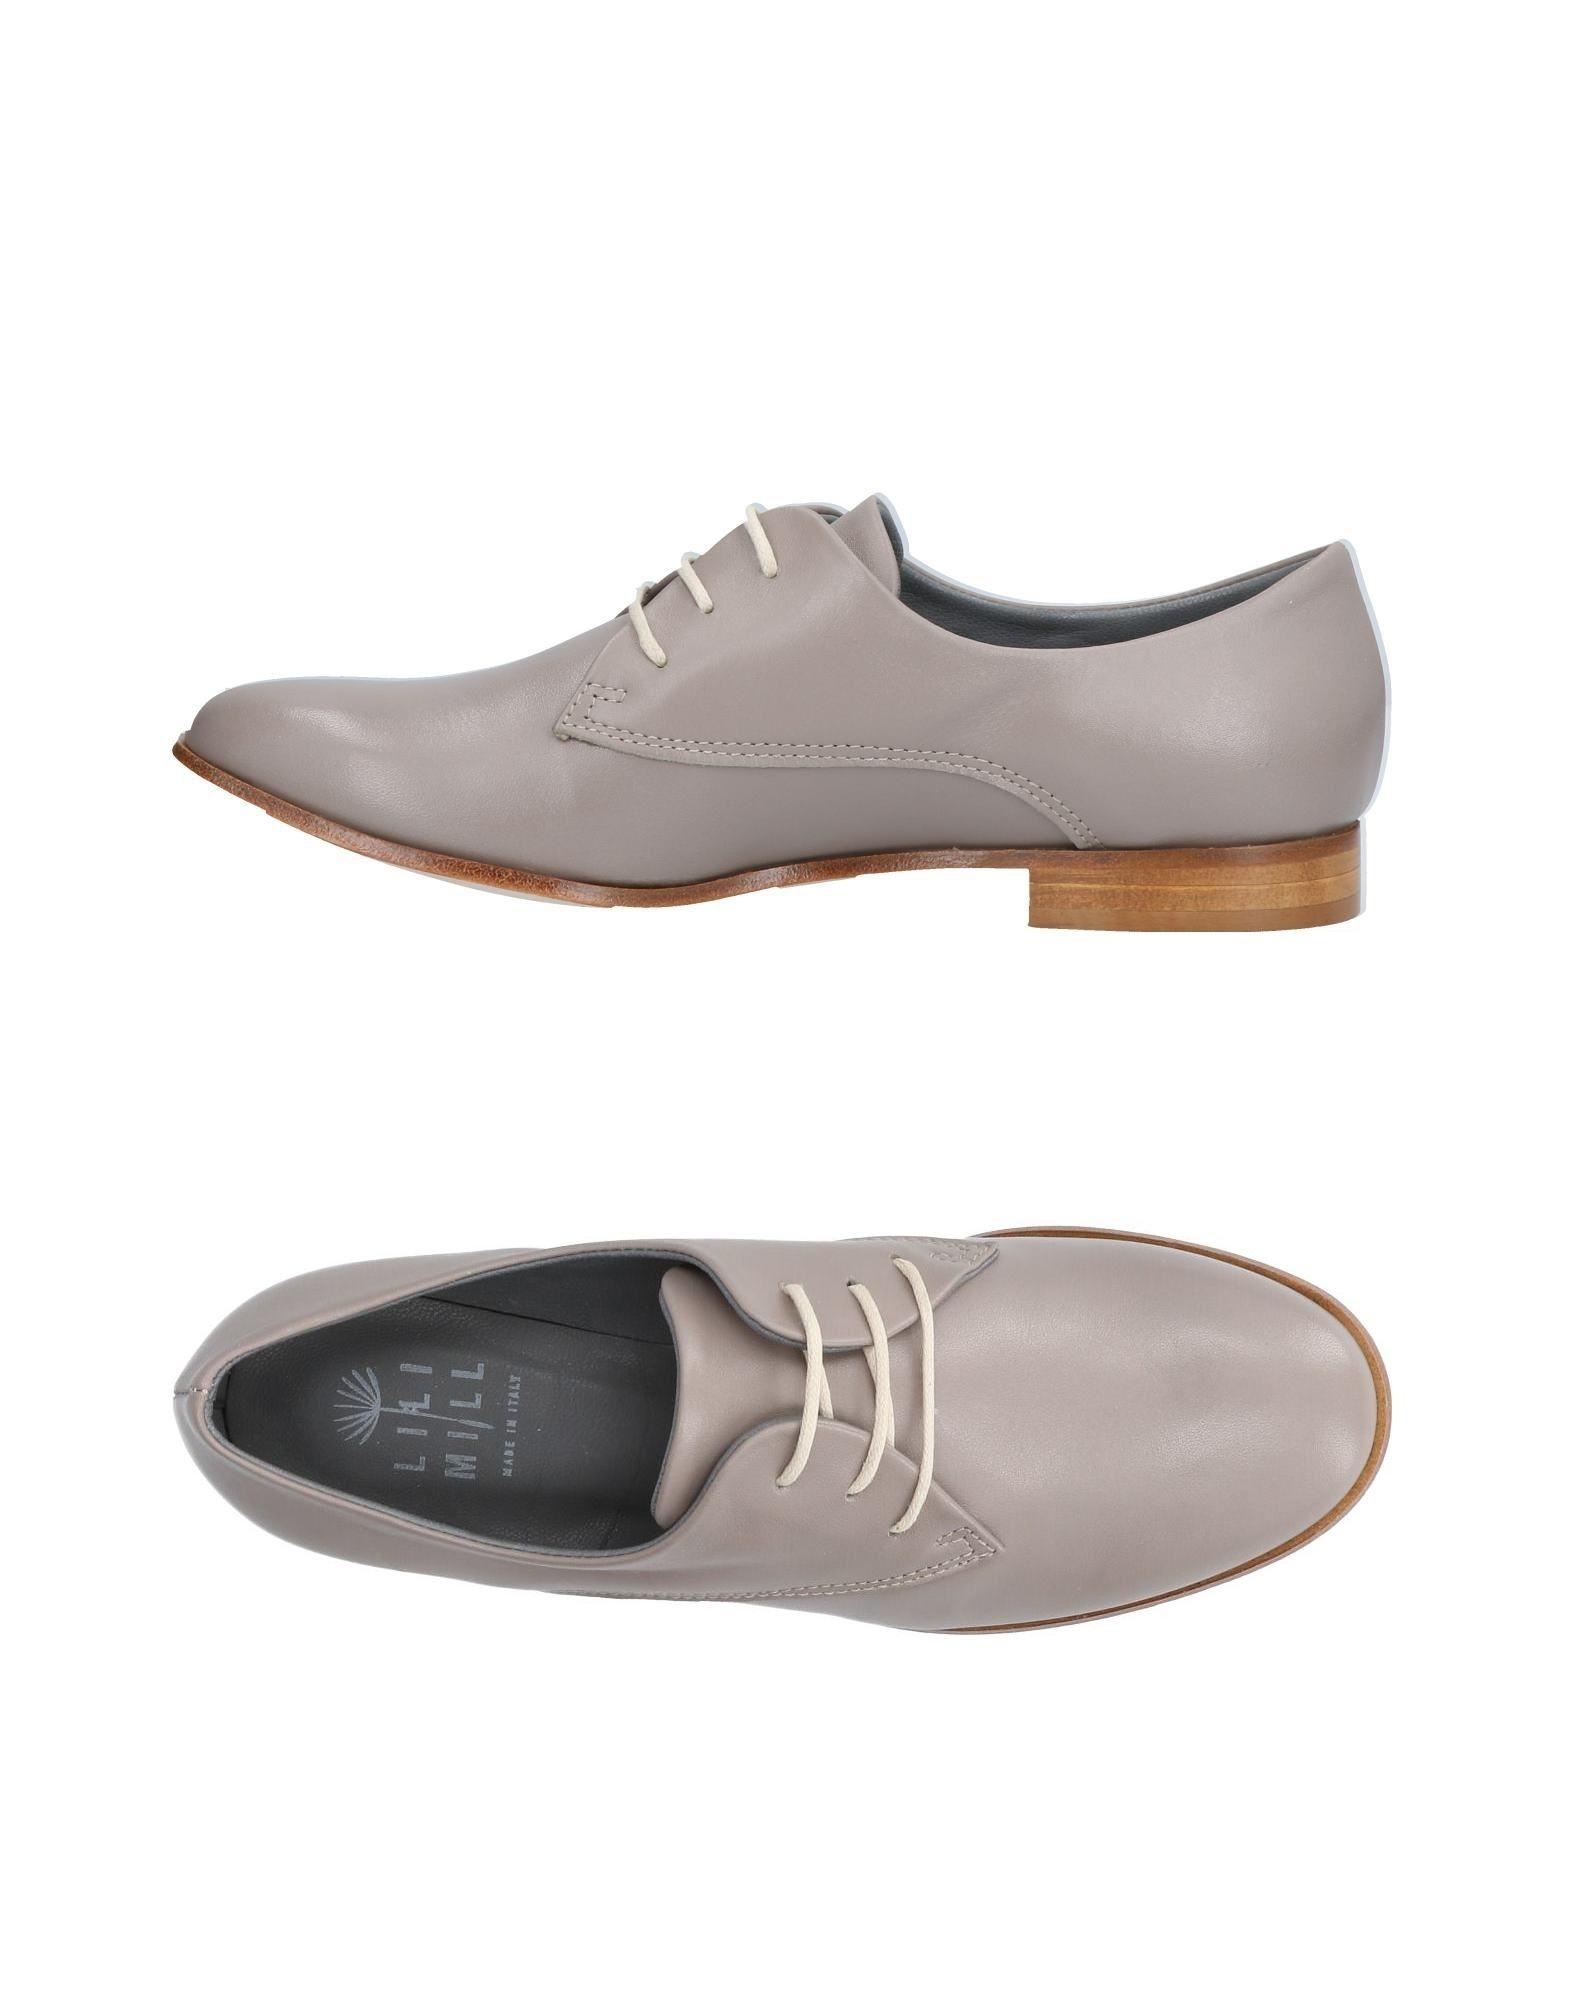 Lilimill Schnürschuhe Damen  11418323AE Gute Qualität beliebte Schuhe